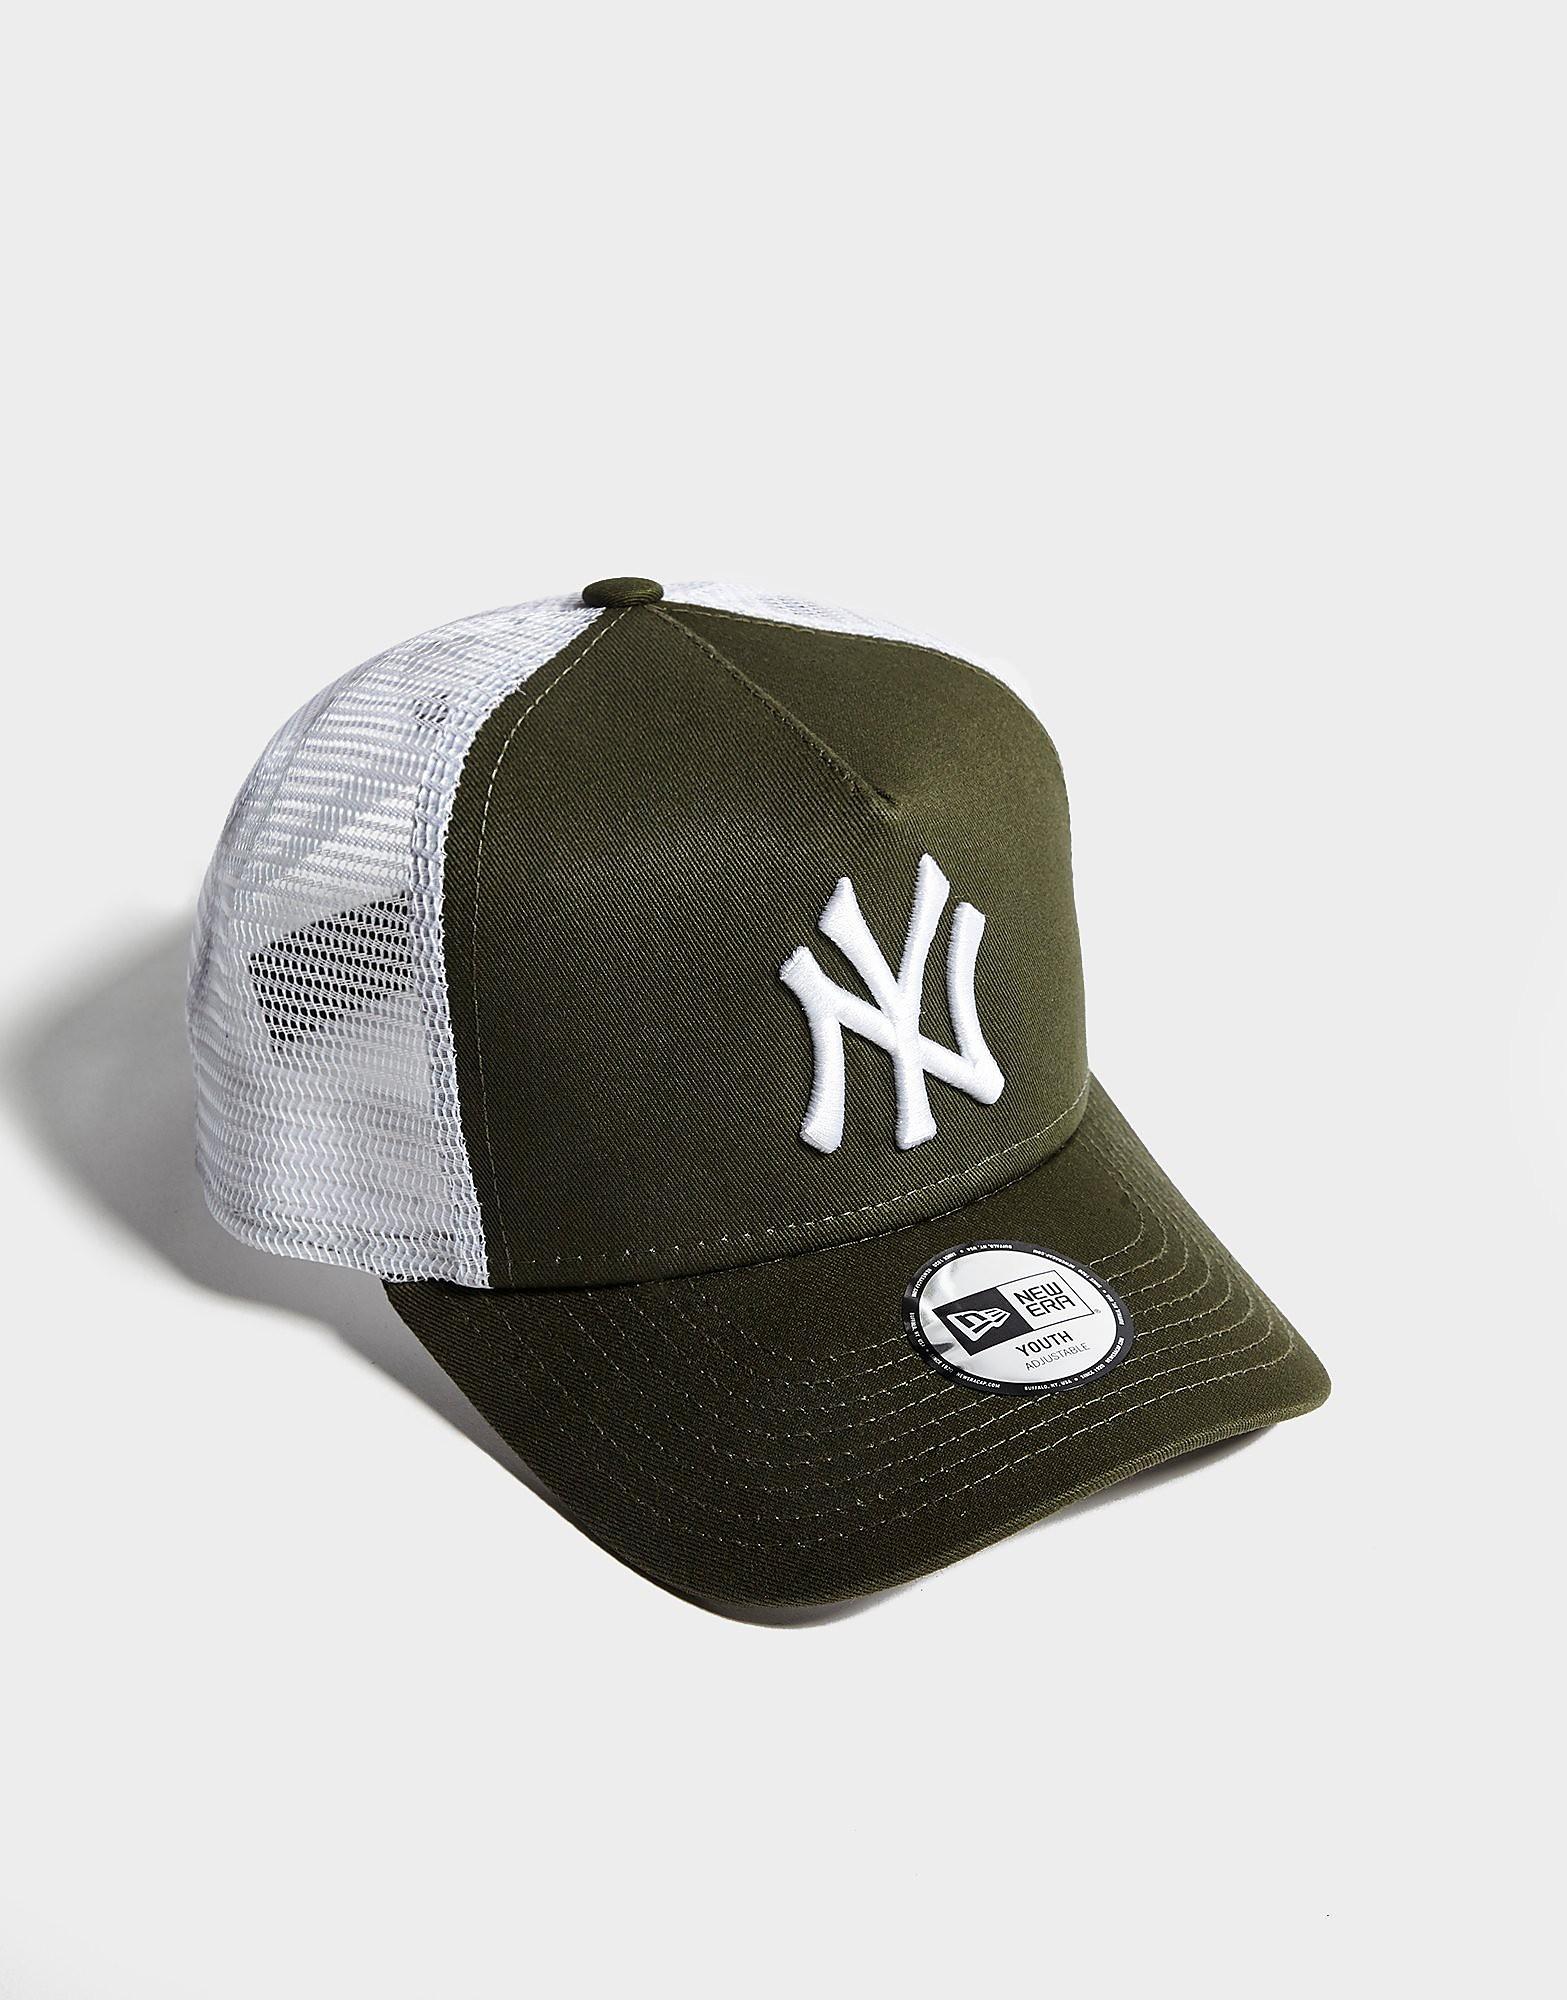 New Era MLB New York Yankees Trucker Cap Junior - Olive/White - Kind